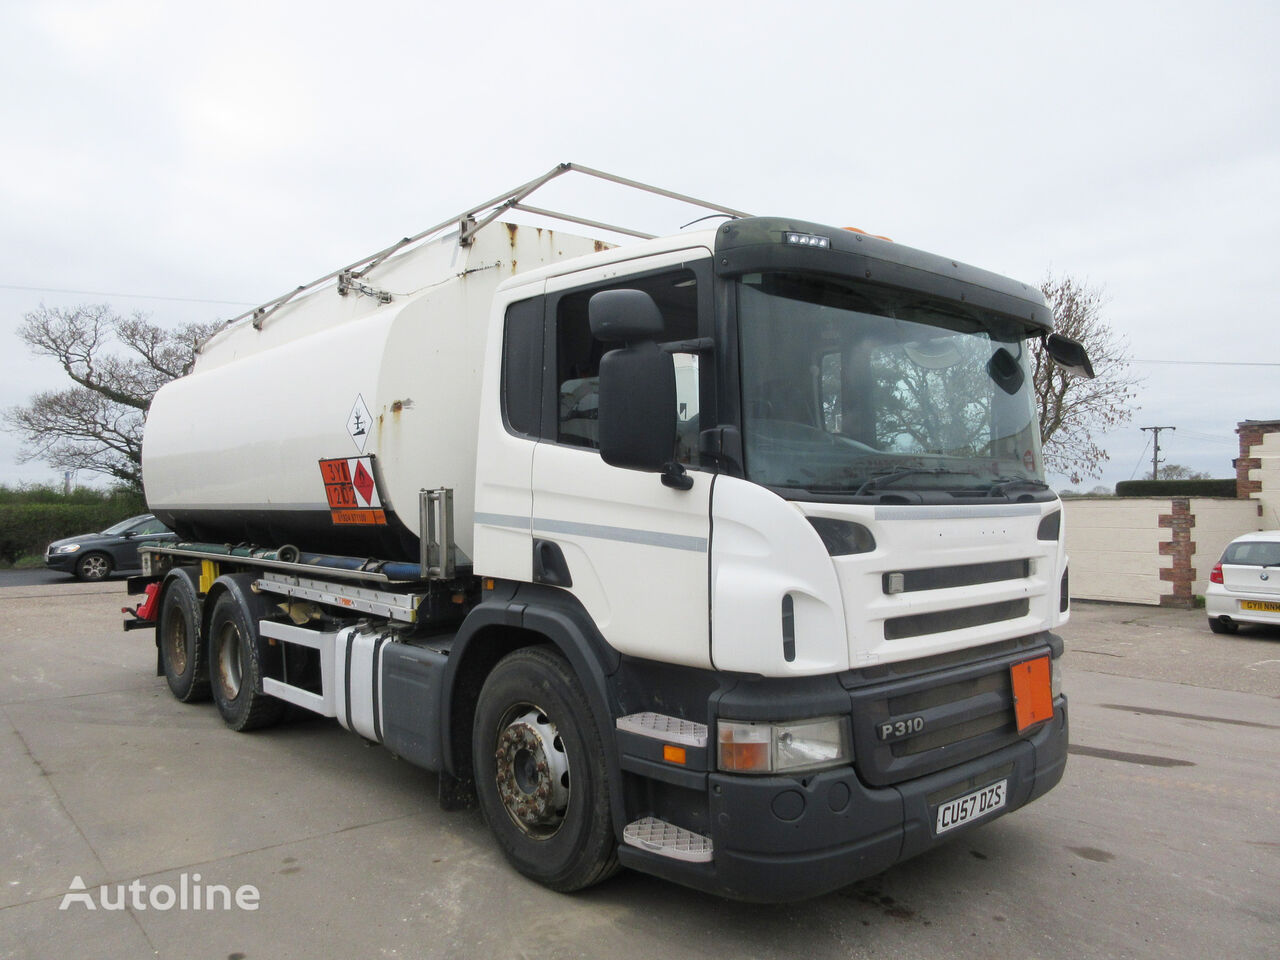 SCANIA P310 fuel truck